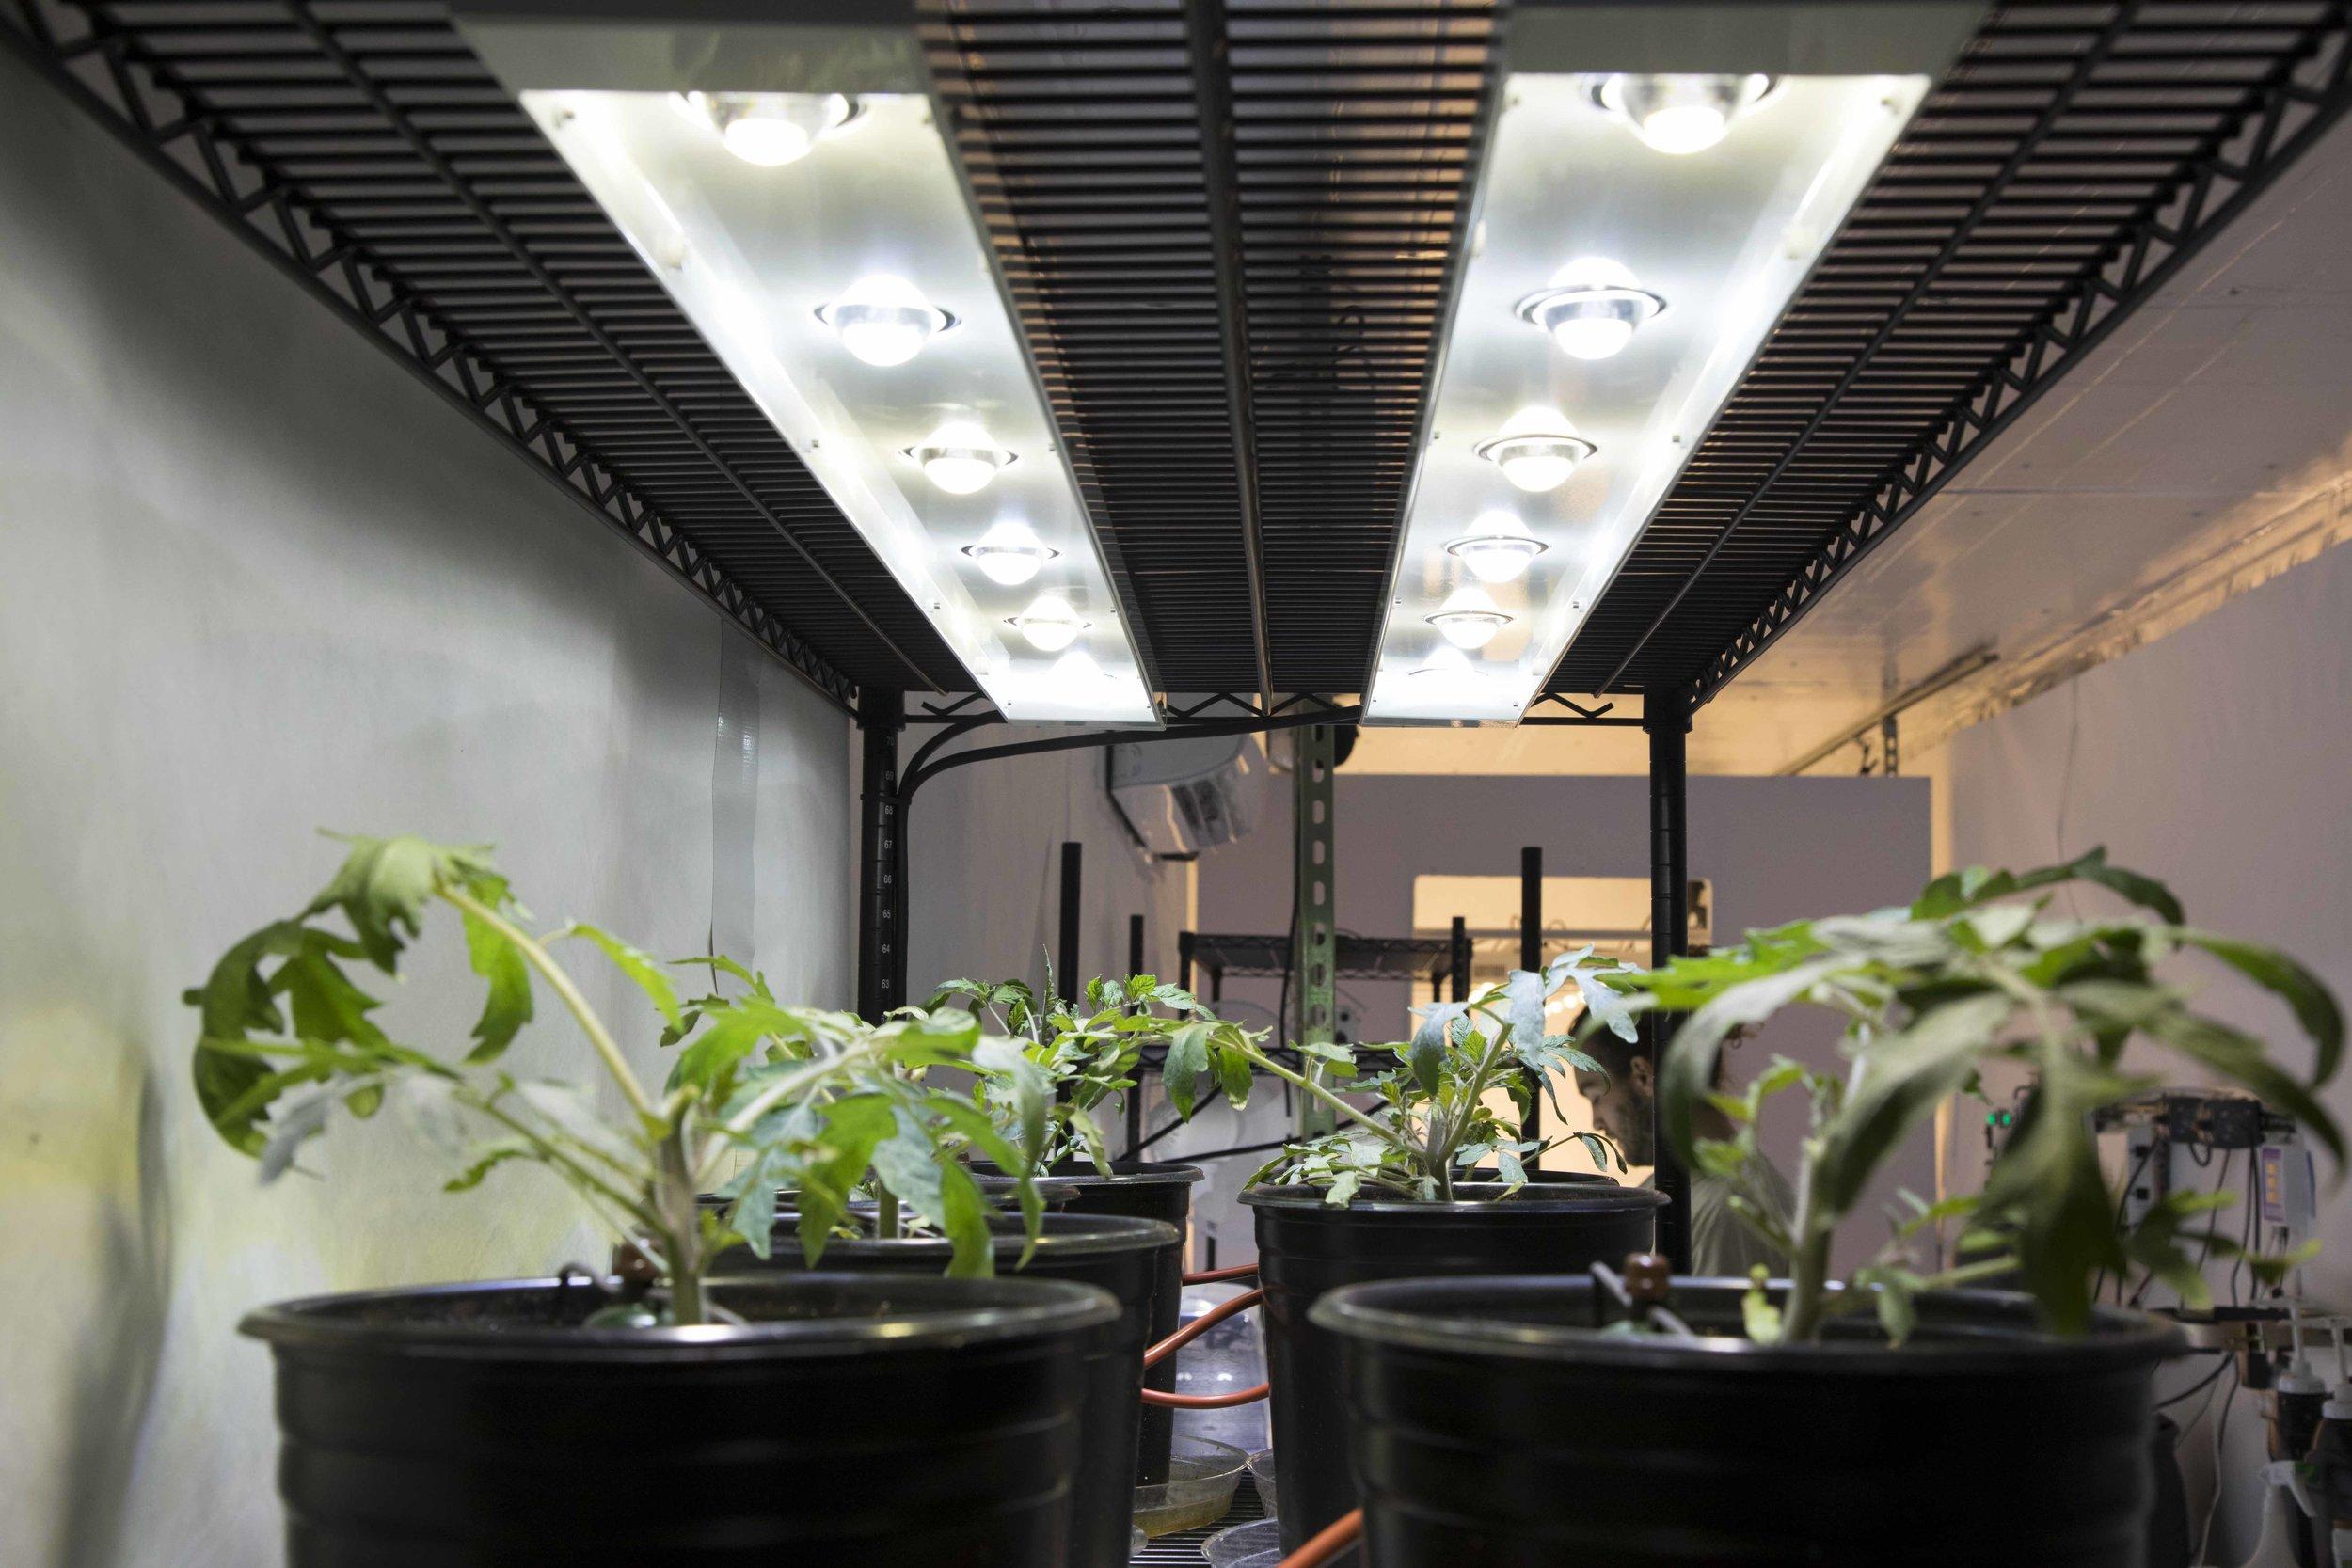 ReLi grow lights at Imagination International warehouse